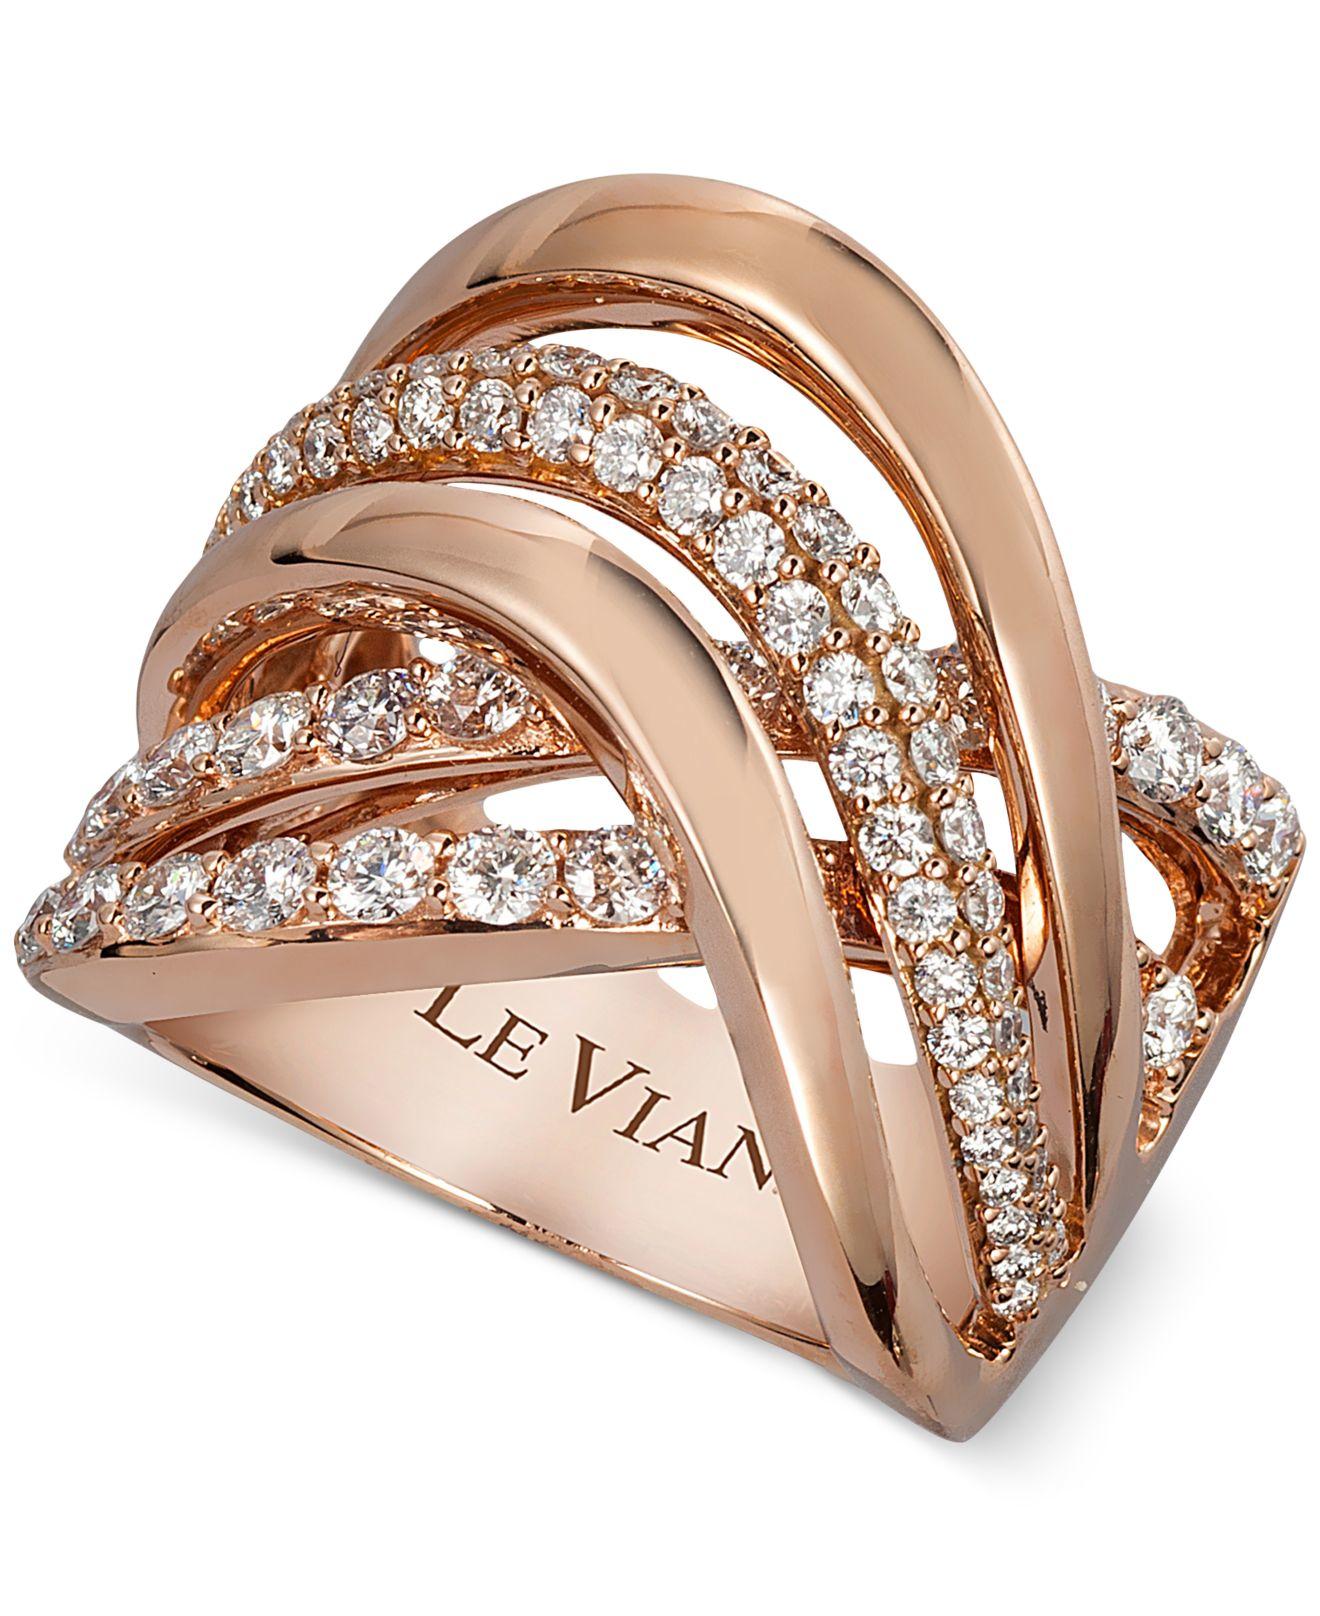 Le vian Vanilla Gladiator Weave™ Diamond Ring 1 1 3 Ct T w In